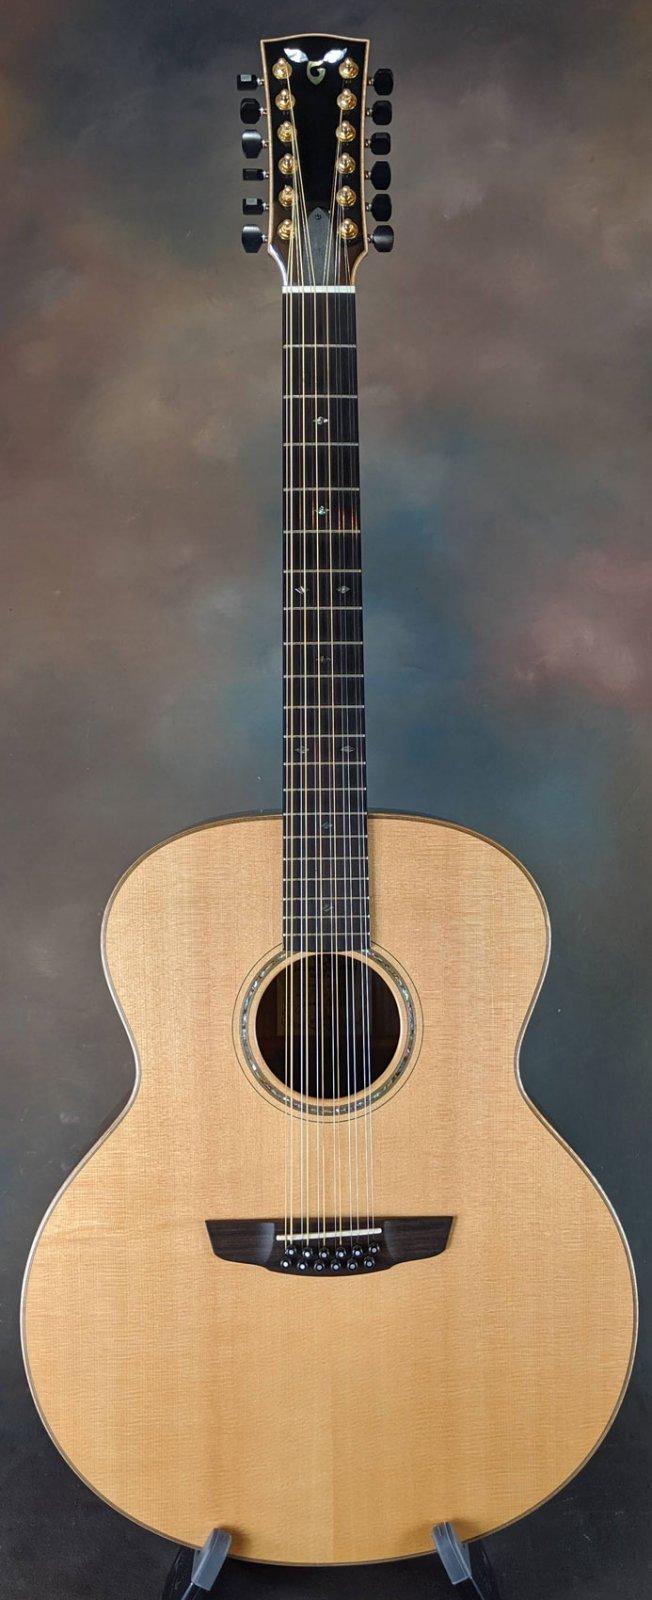 2010 Goodall Rosewood Jumbo 12 String